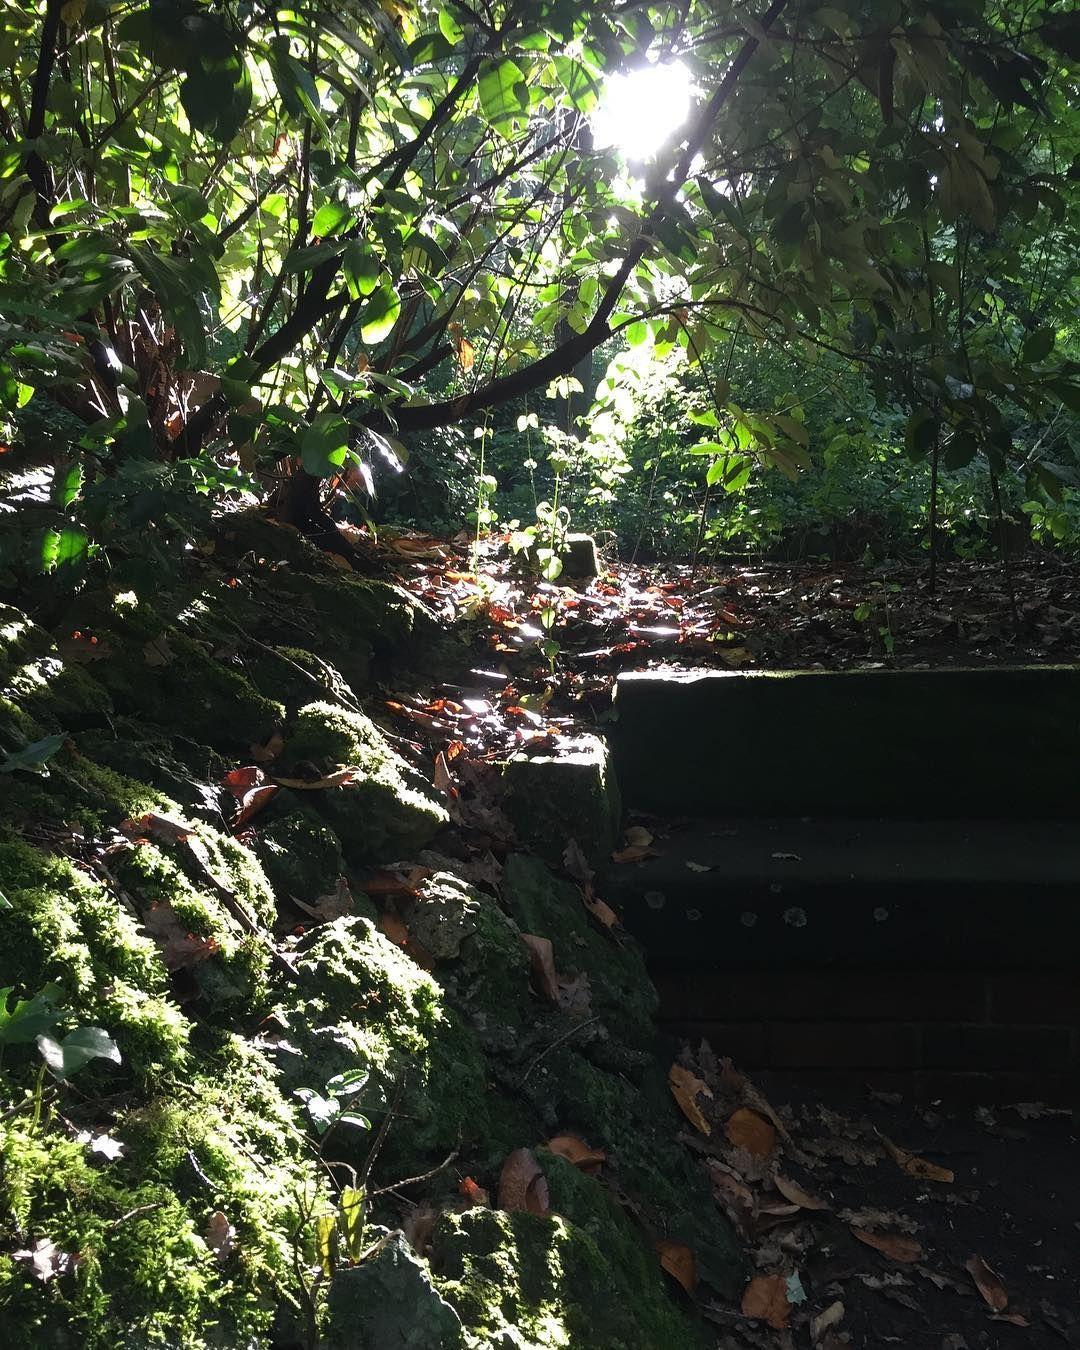 #stone #bench #woods #mossy #moss #saarbrücken #saarland